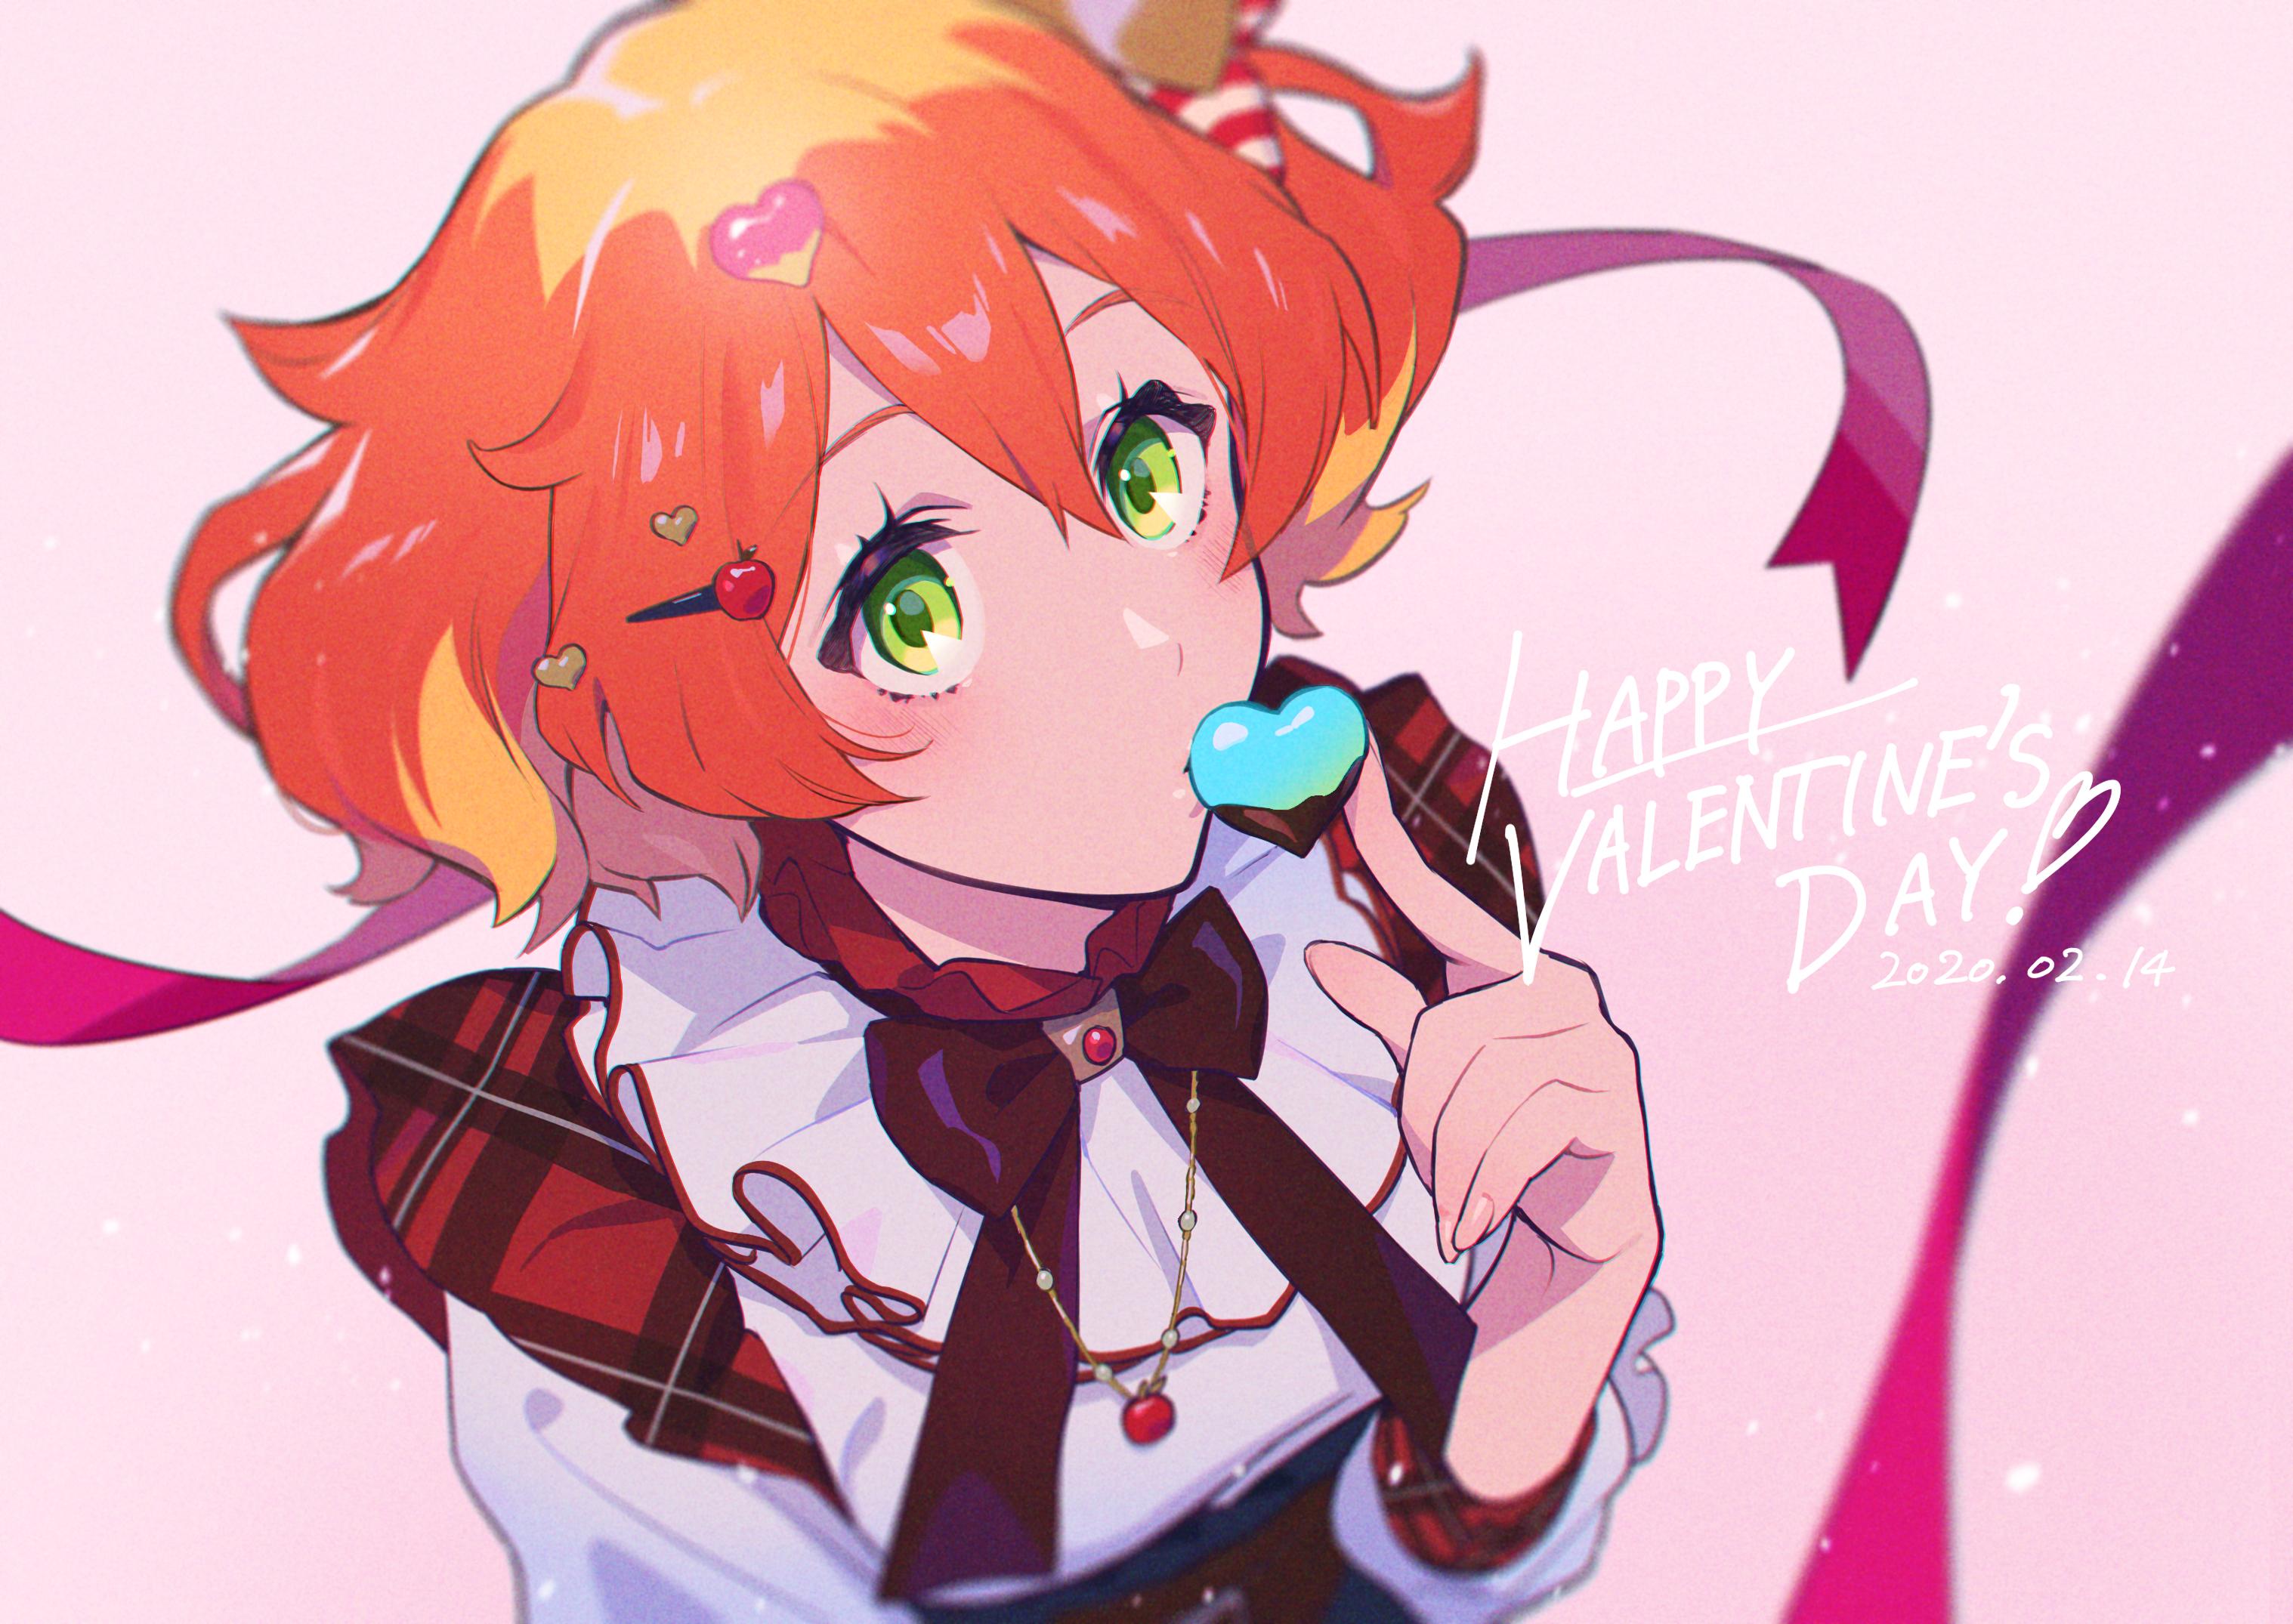 Anime 3035x2150 anime anime girls Valentine's Day Macross Delta Freyja Wion readhead anime girls eating